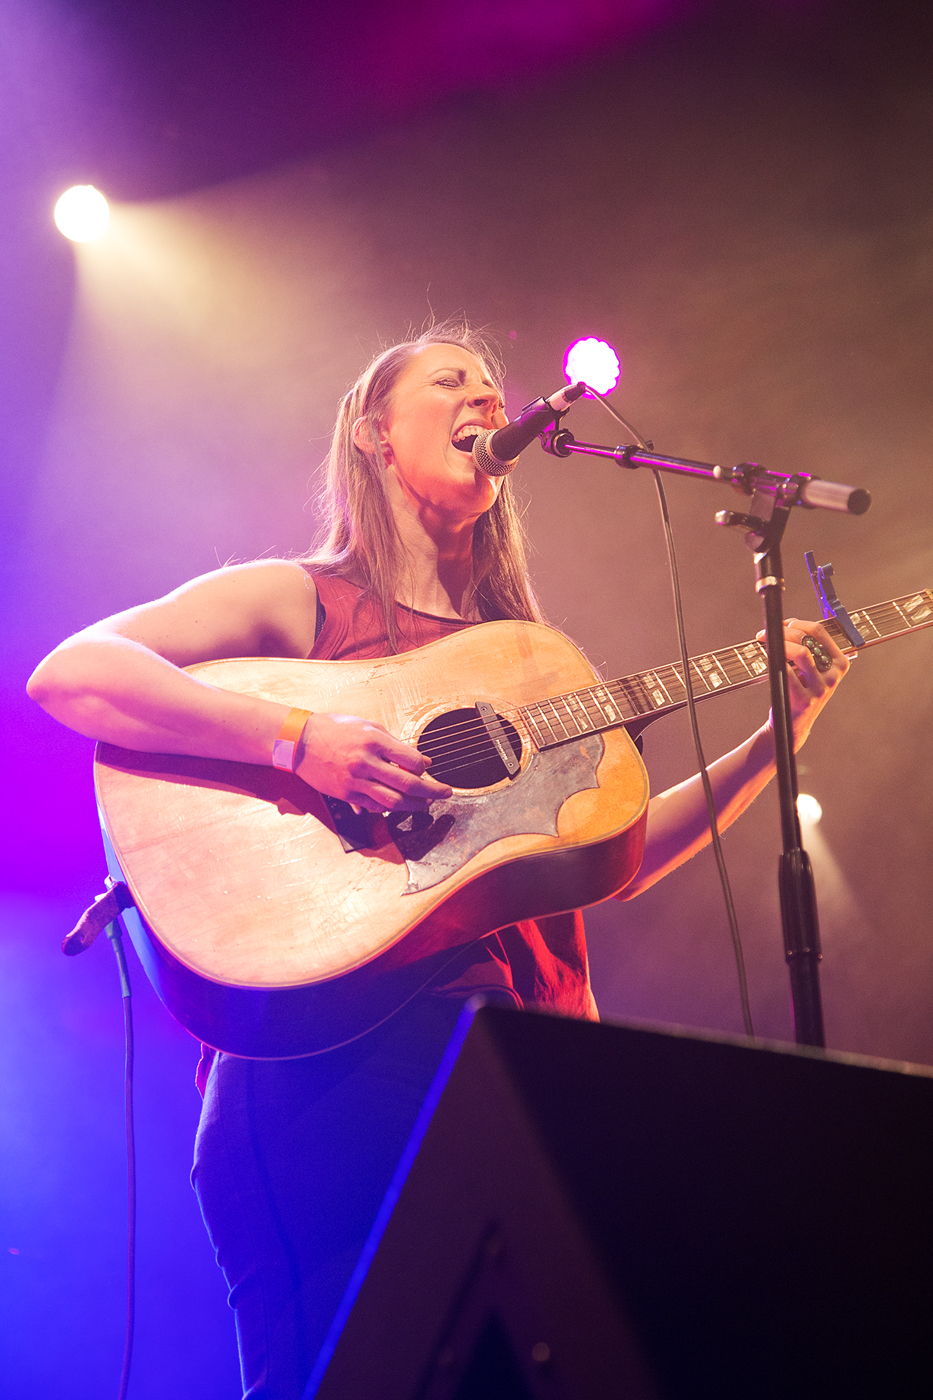 Katie Powderly Playing Guitar